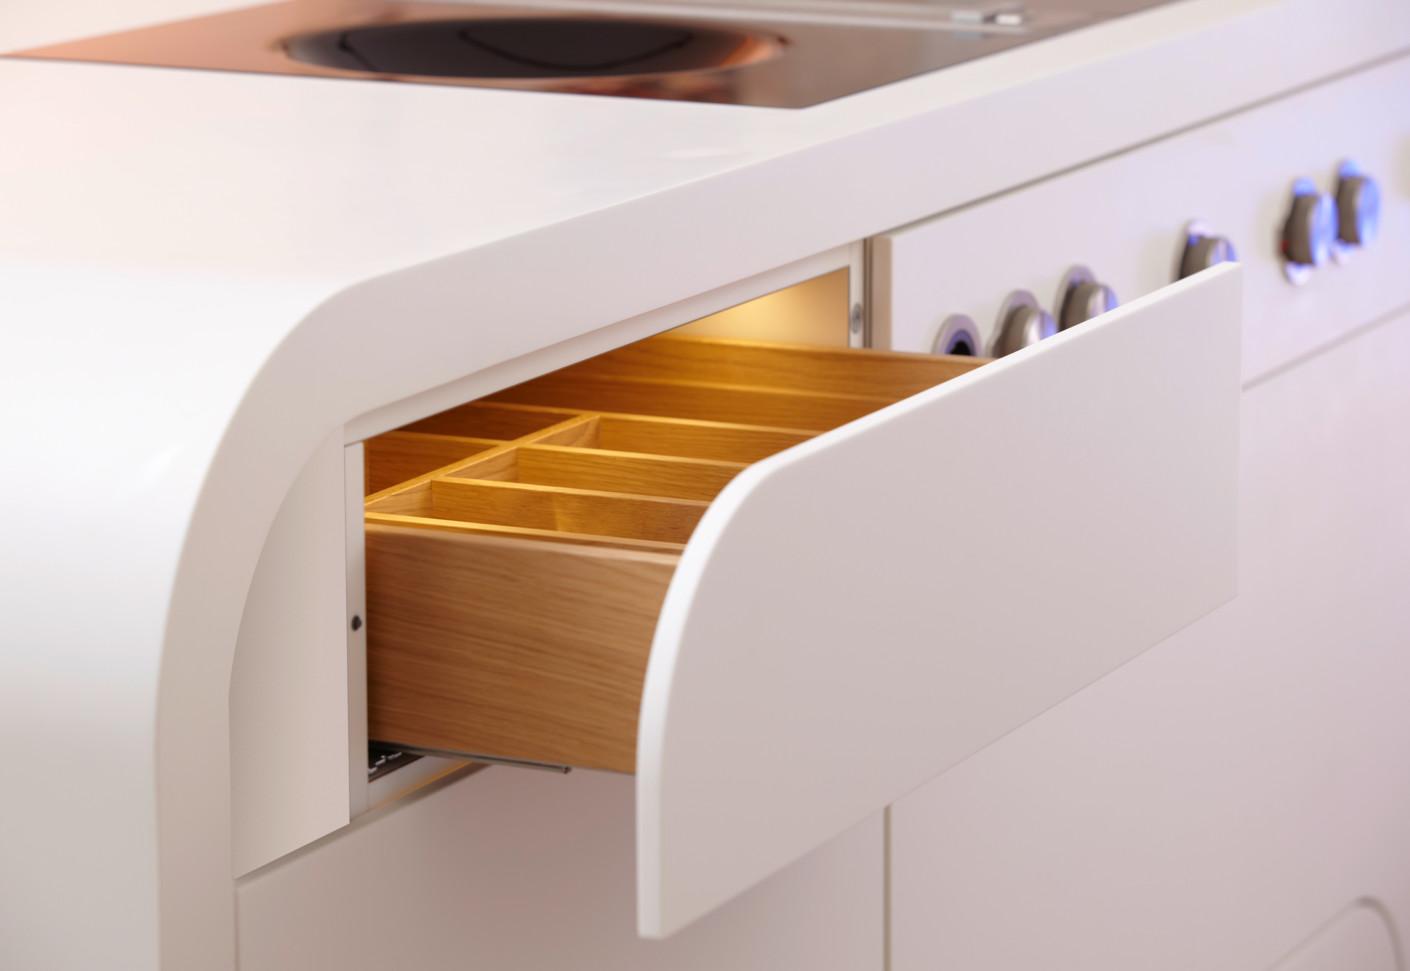 dupont corian kitchen m belschmiede by dupont corian. Black Bedroom Furniture Sets. Home Design Ideas